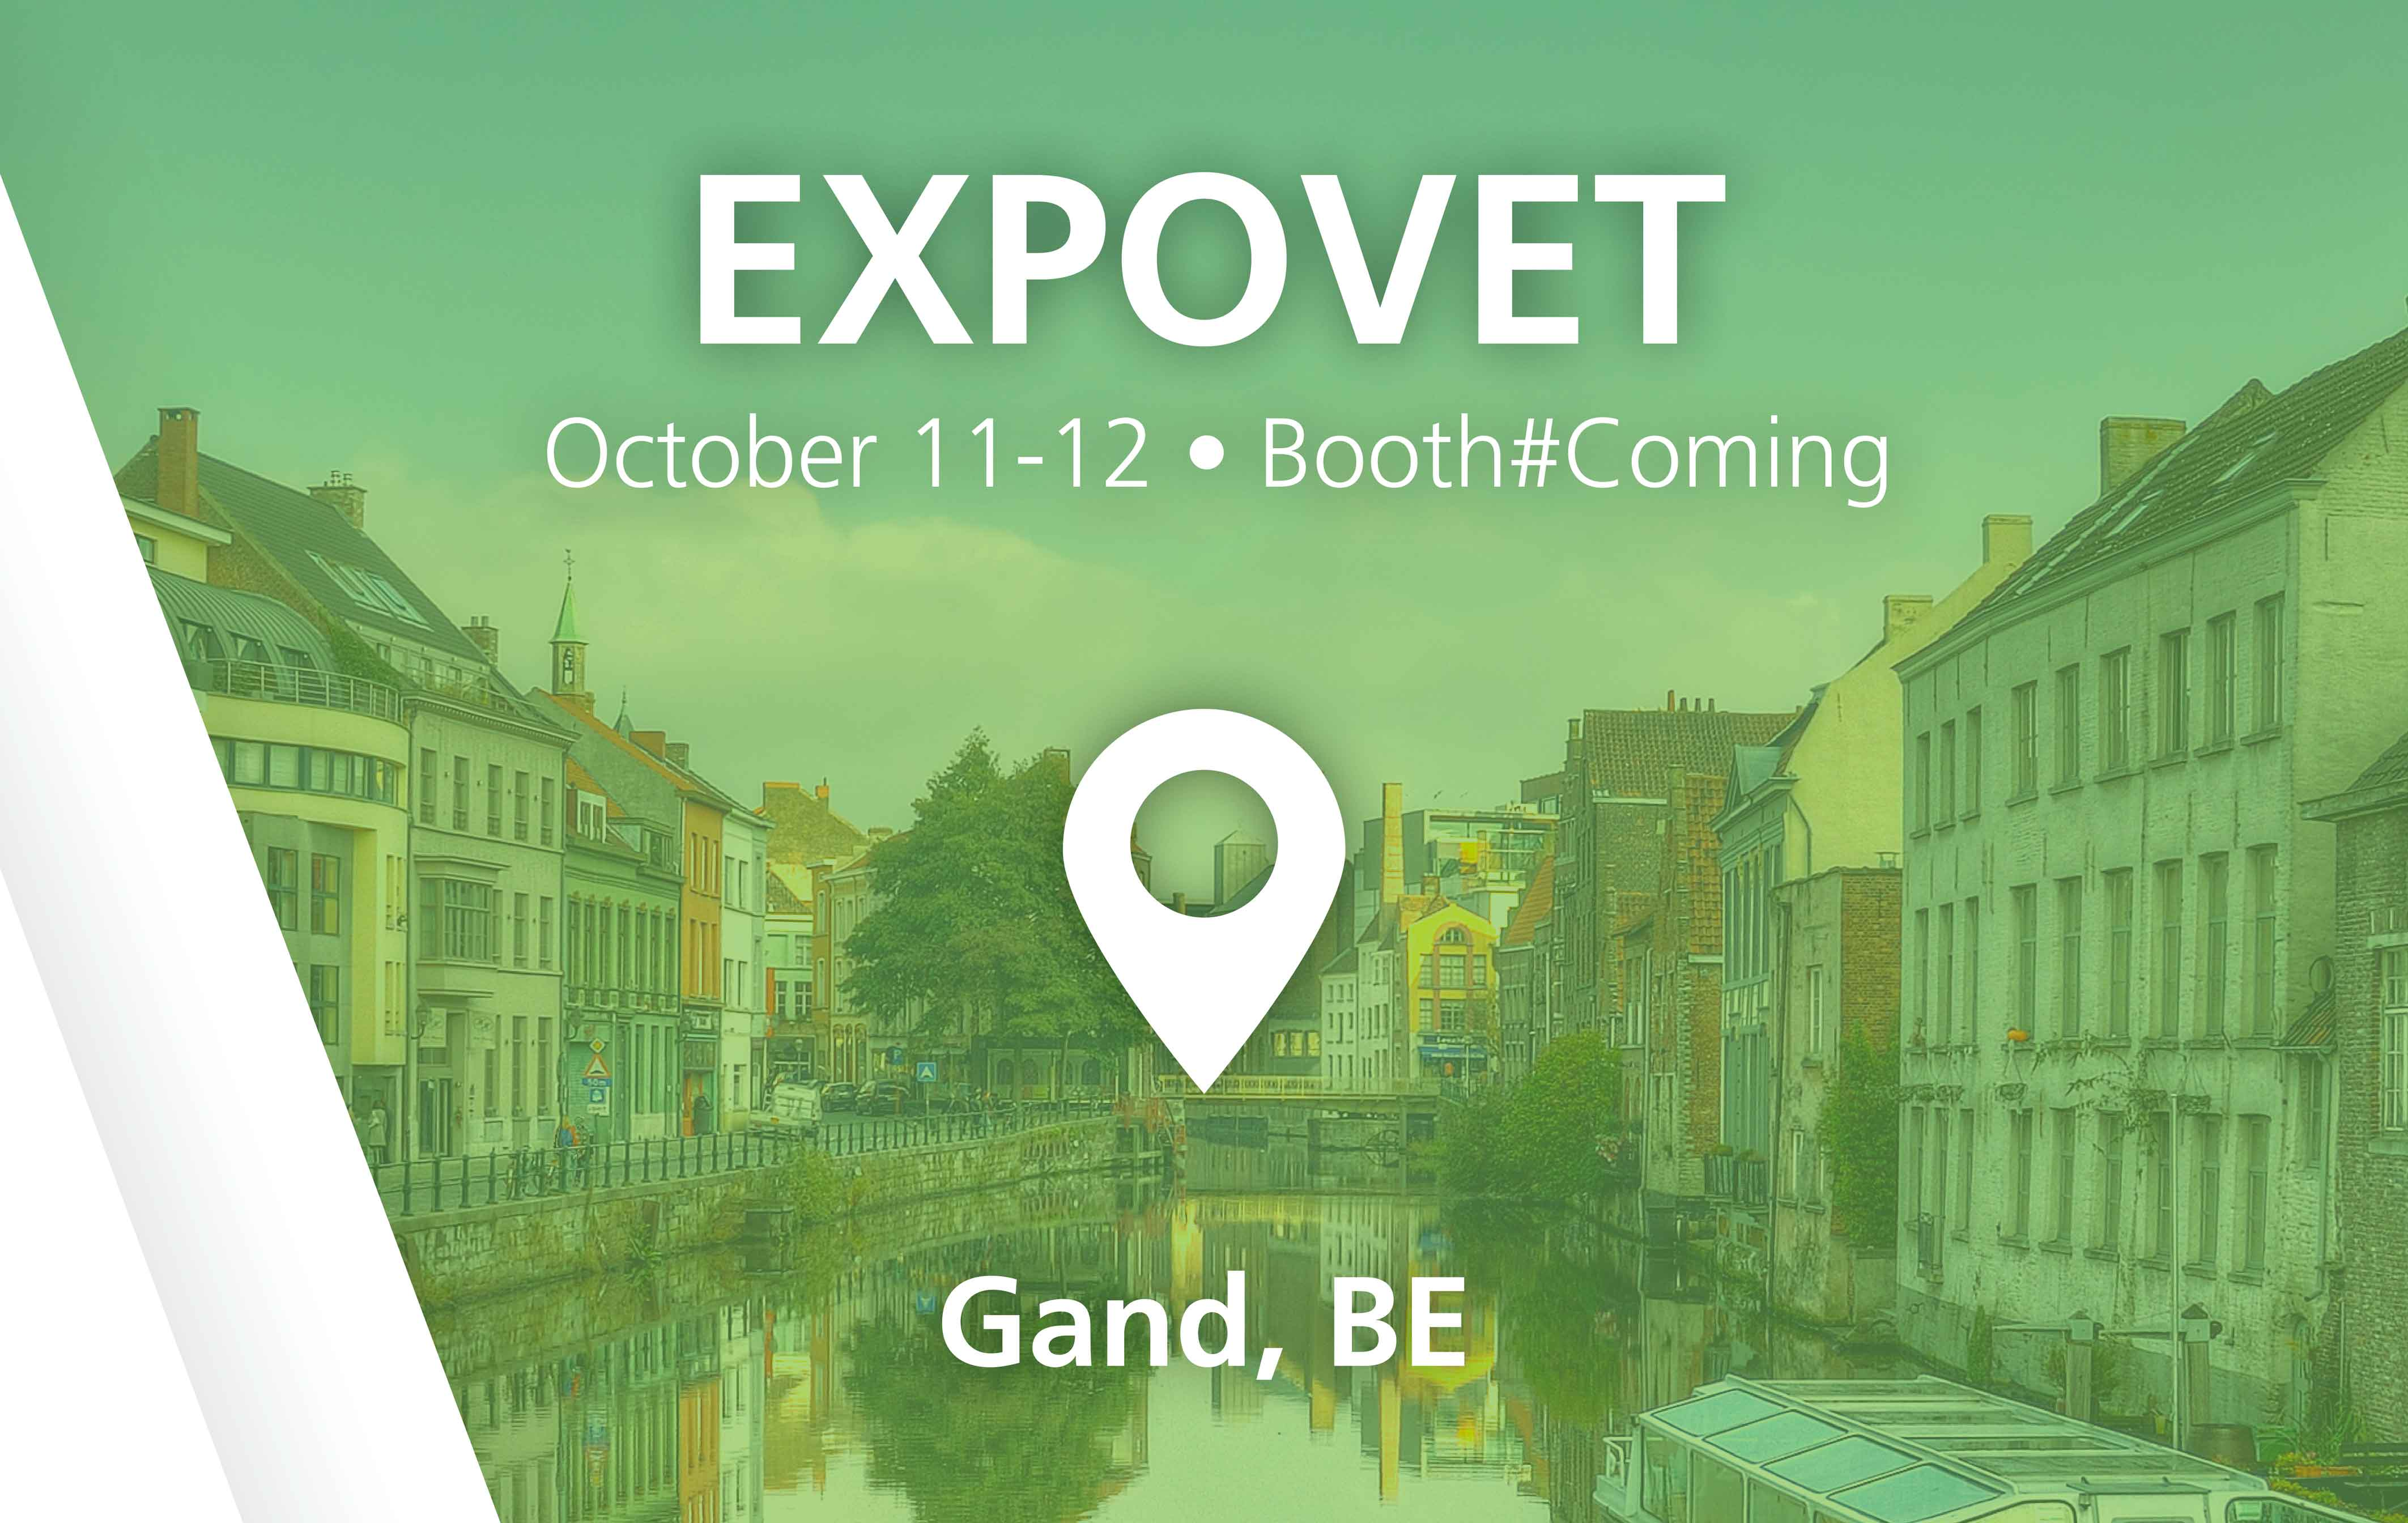 EXPOVET - Gand, BE - October 11-12